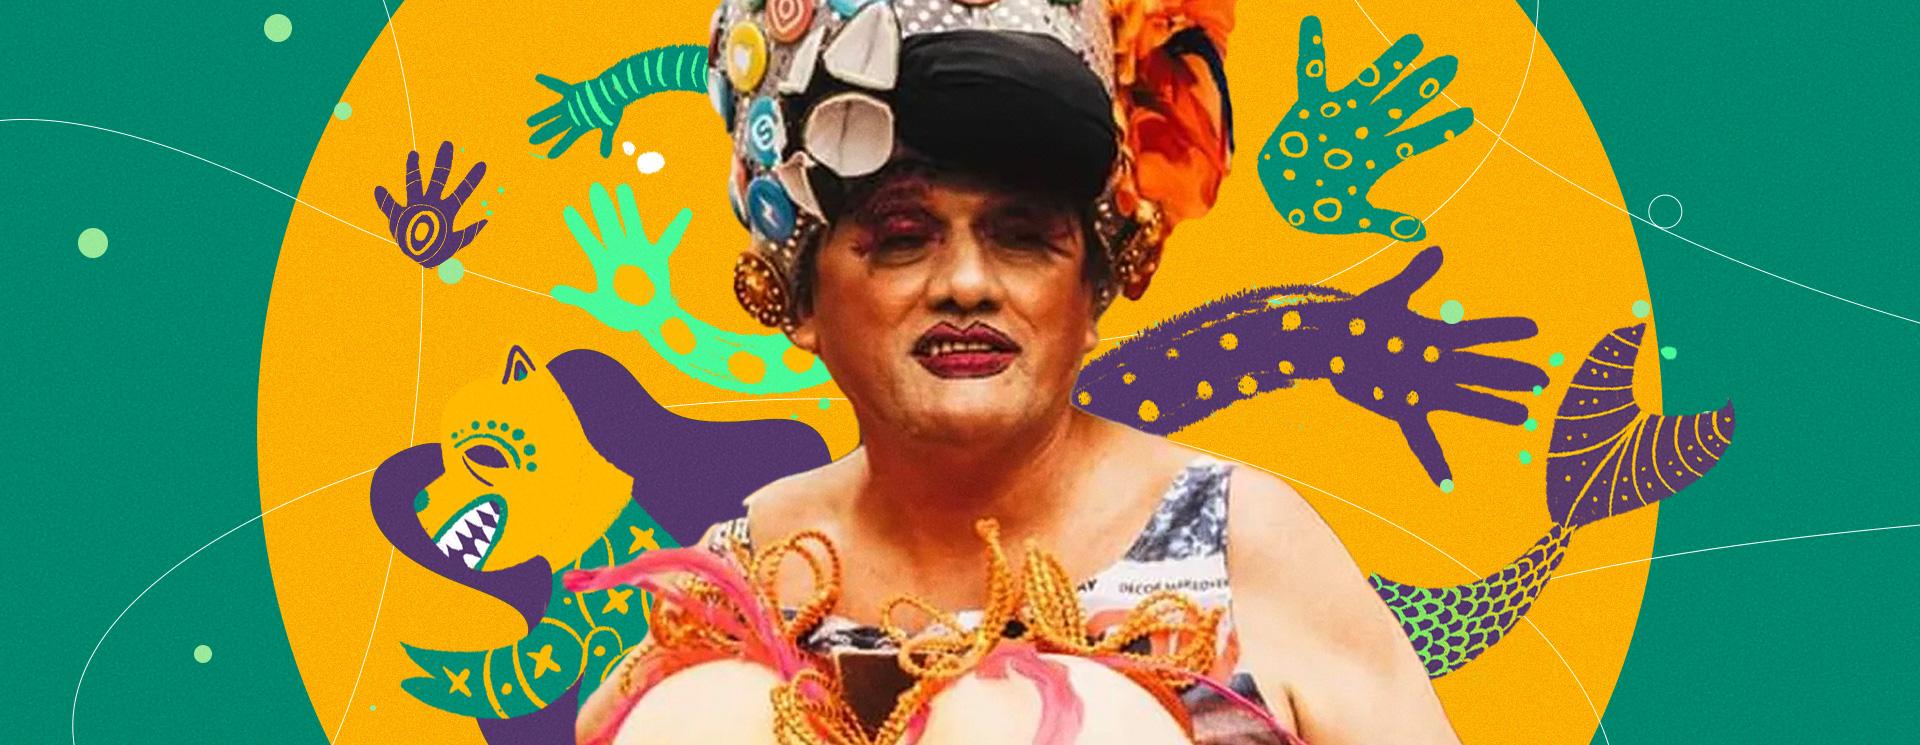 BLOCOS LGBTQ CARNAVAL natal